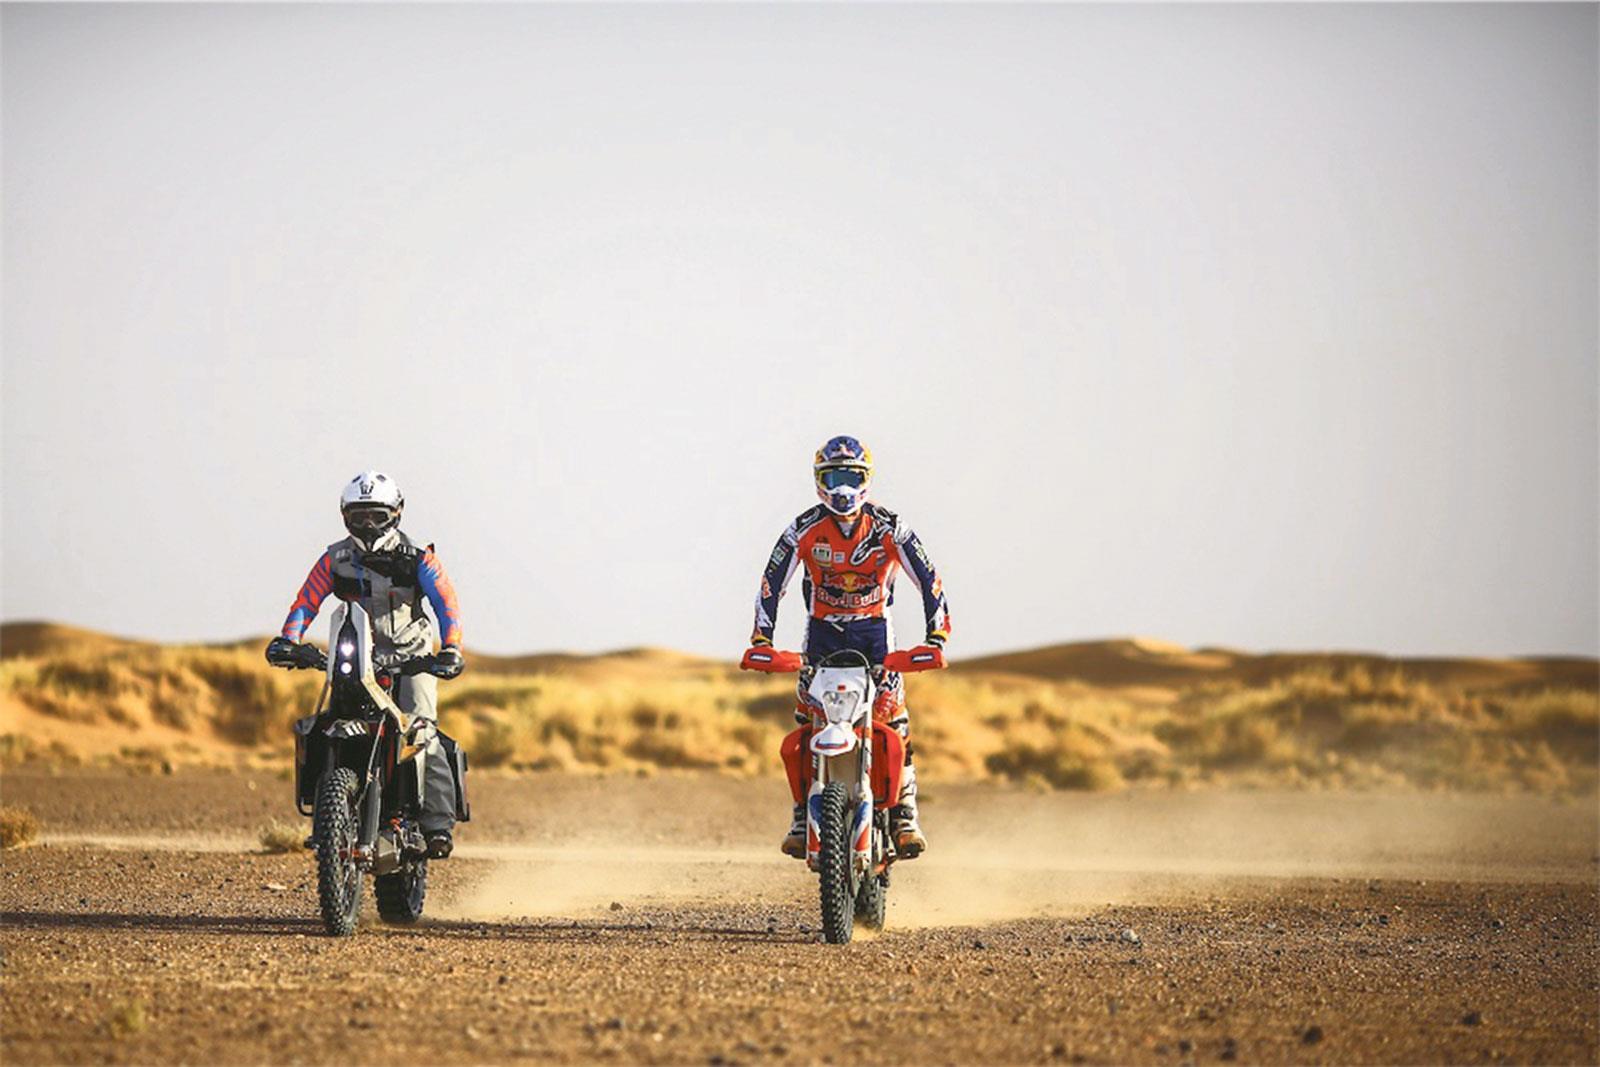 Desert riding #ride5000miles